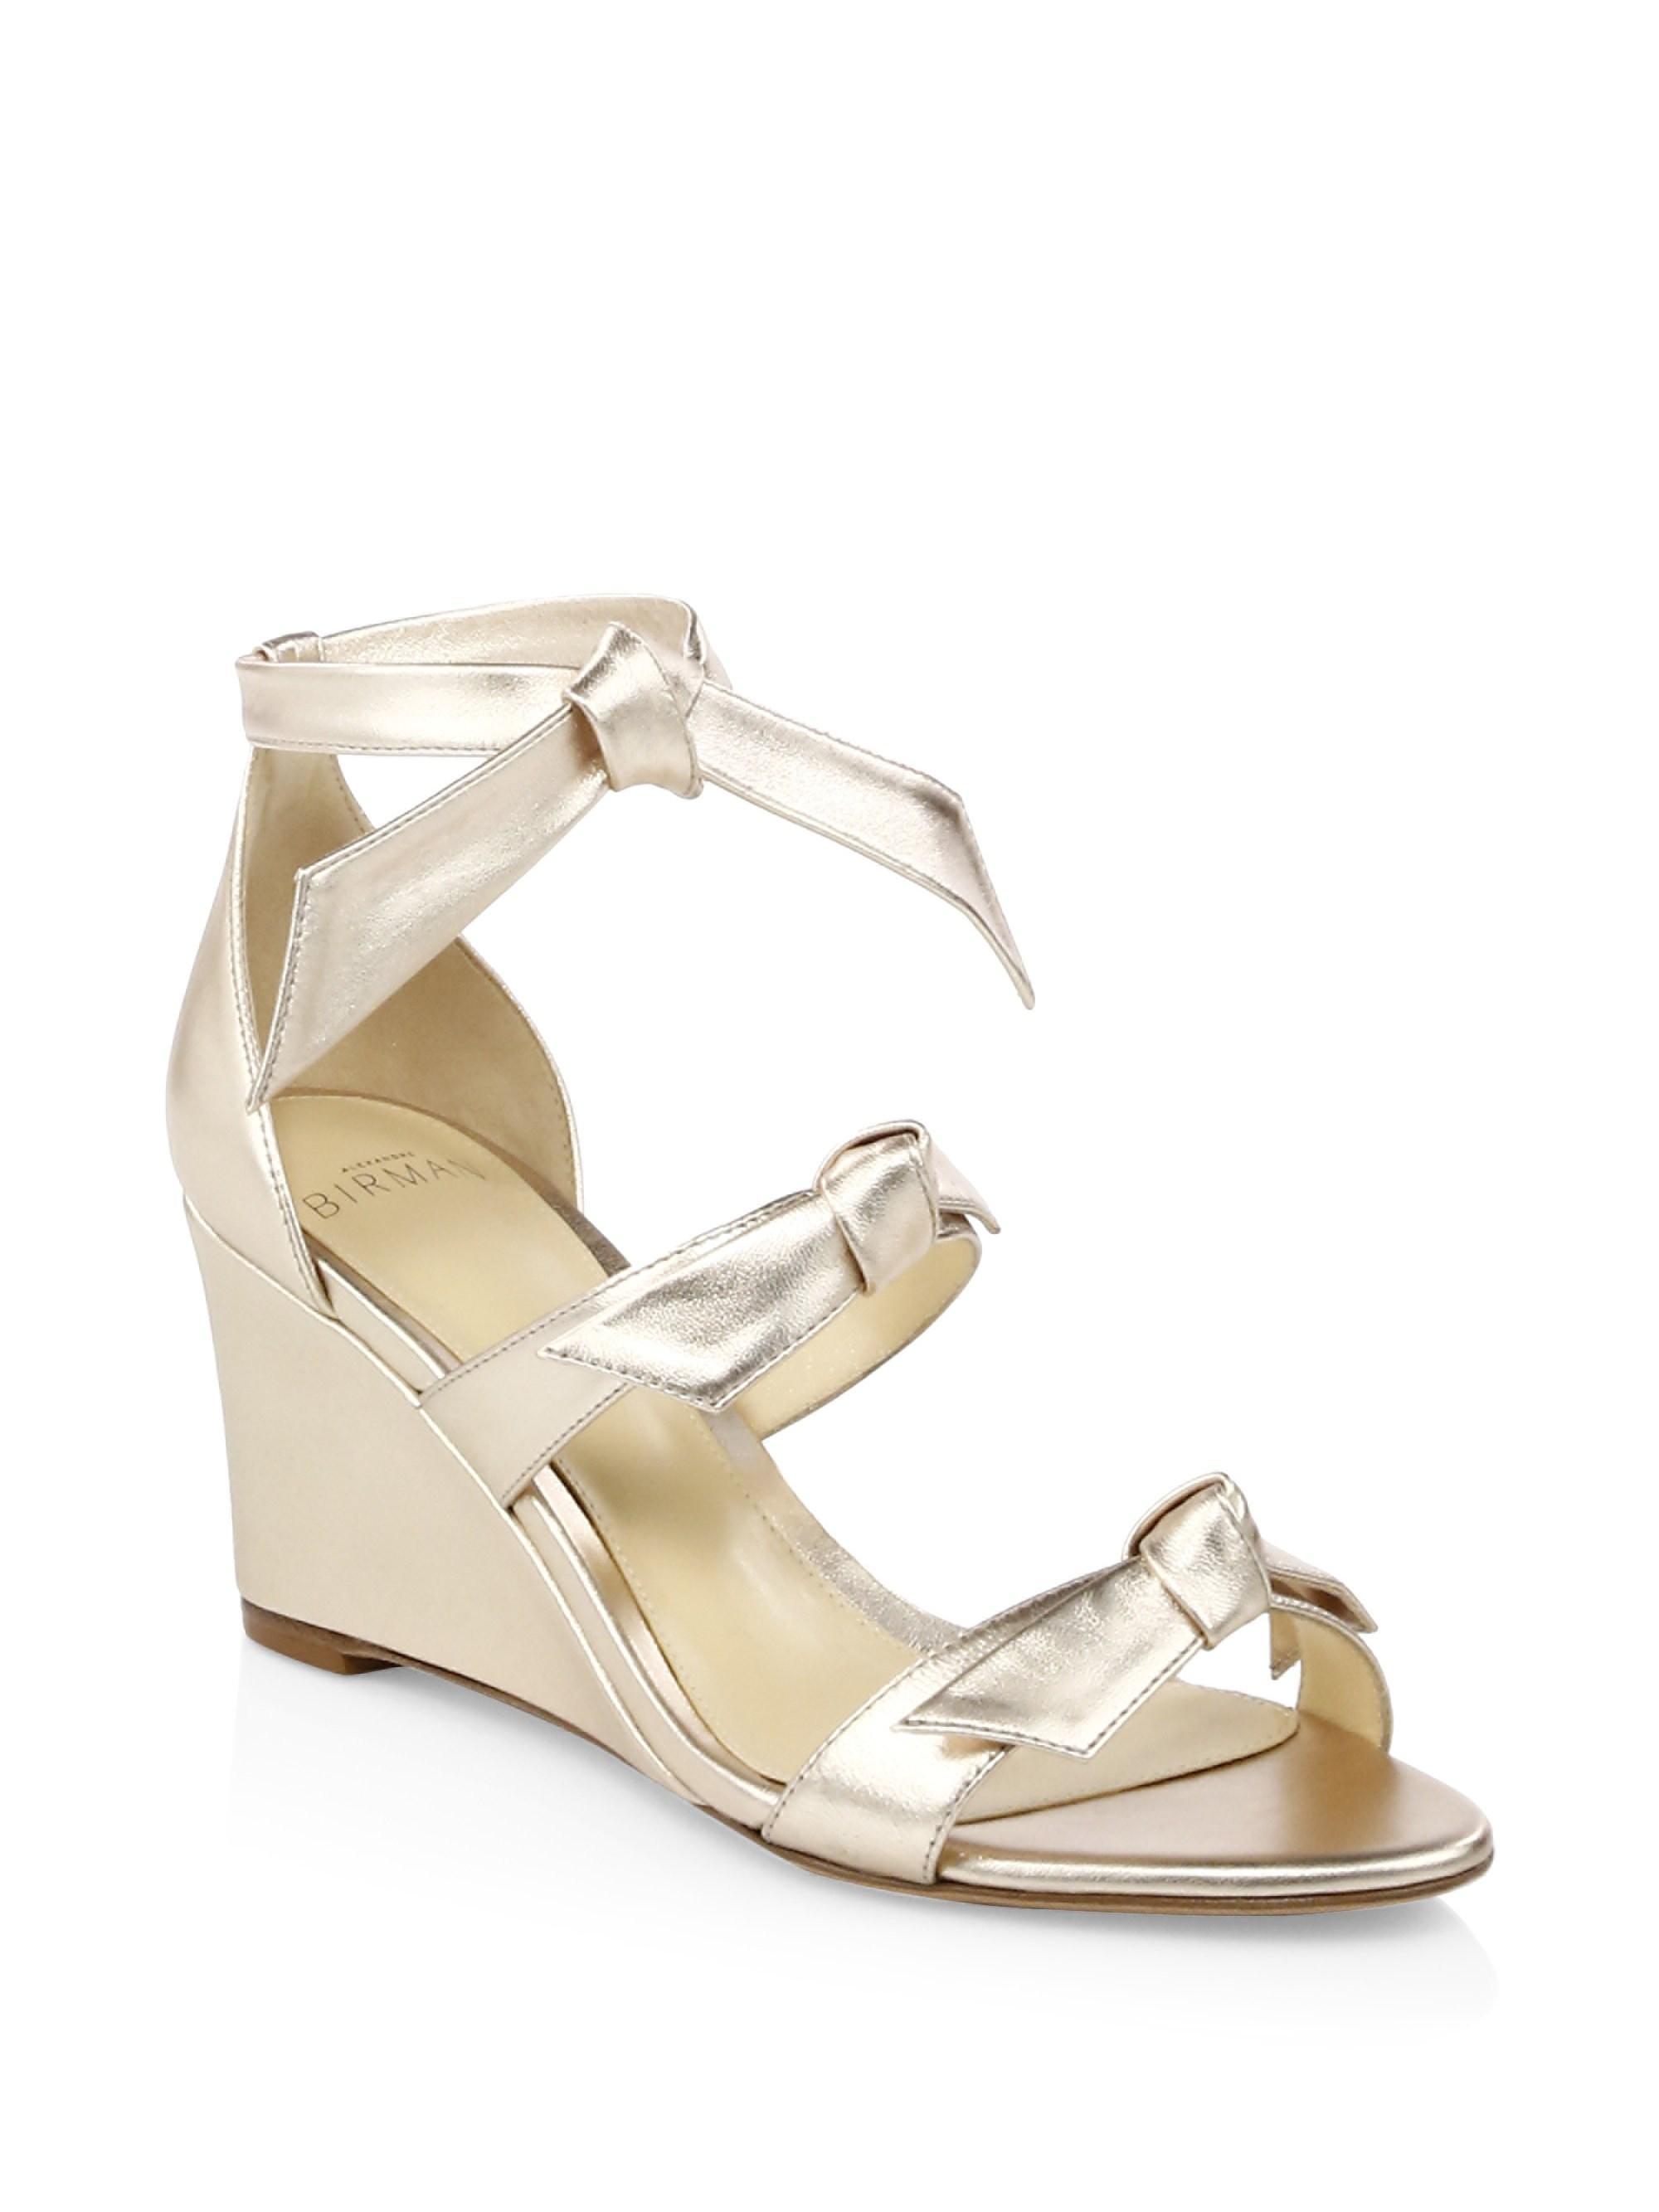 68f030d69ca1 Lyst - Alexandre Birman Golden Lolita Wedge in Metallic